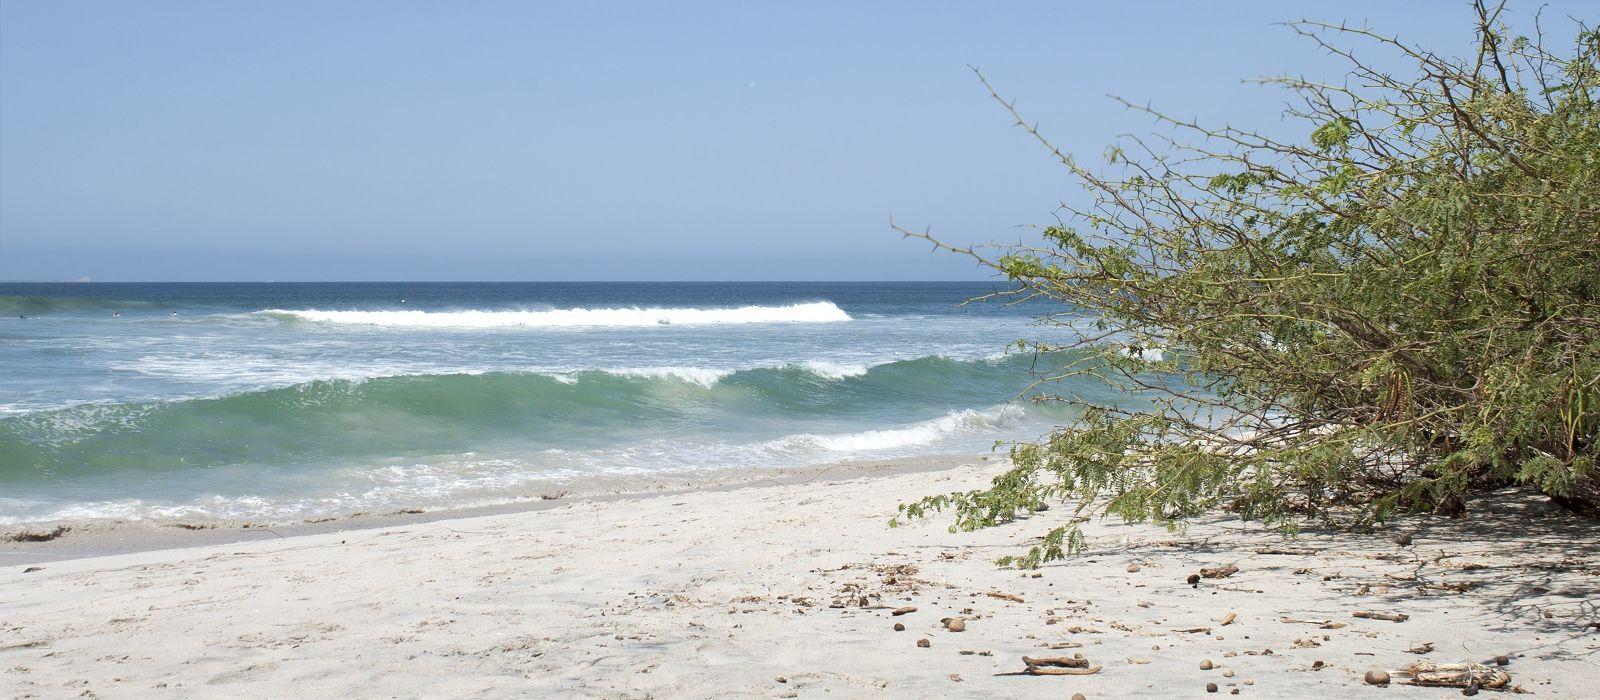 Mexico's Colonial Gems and Beach Tour Trip 4